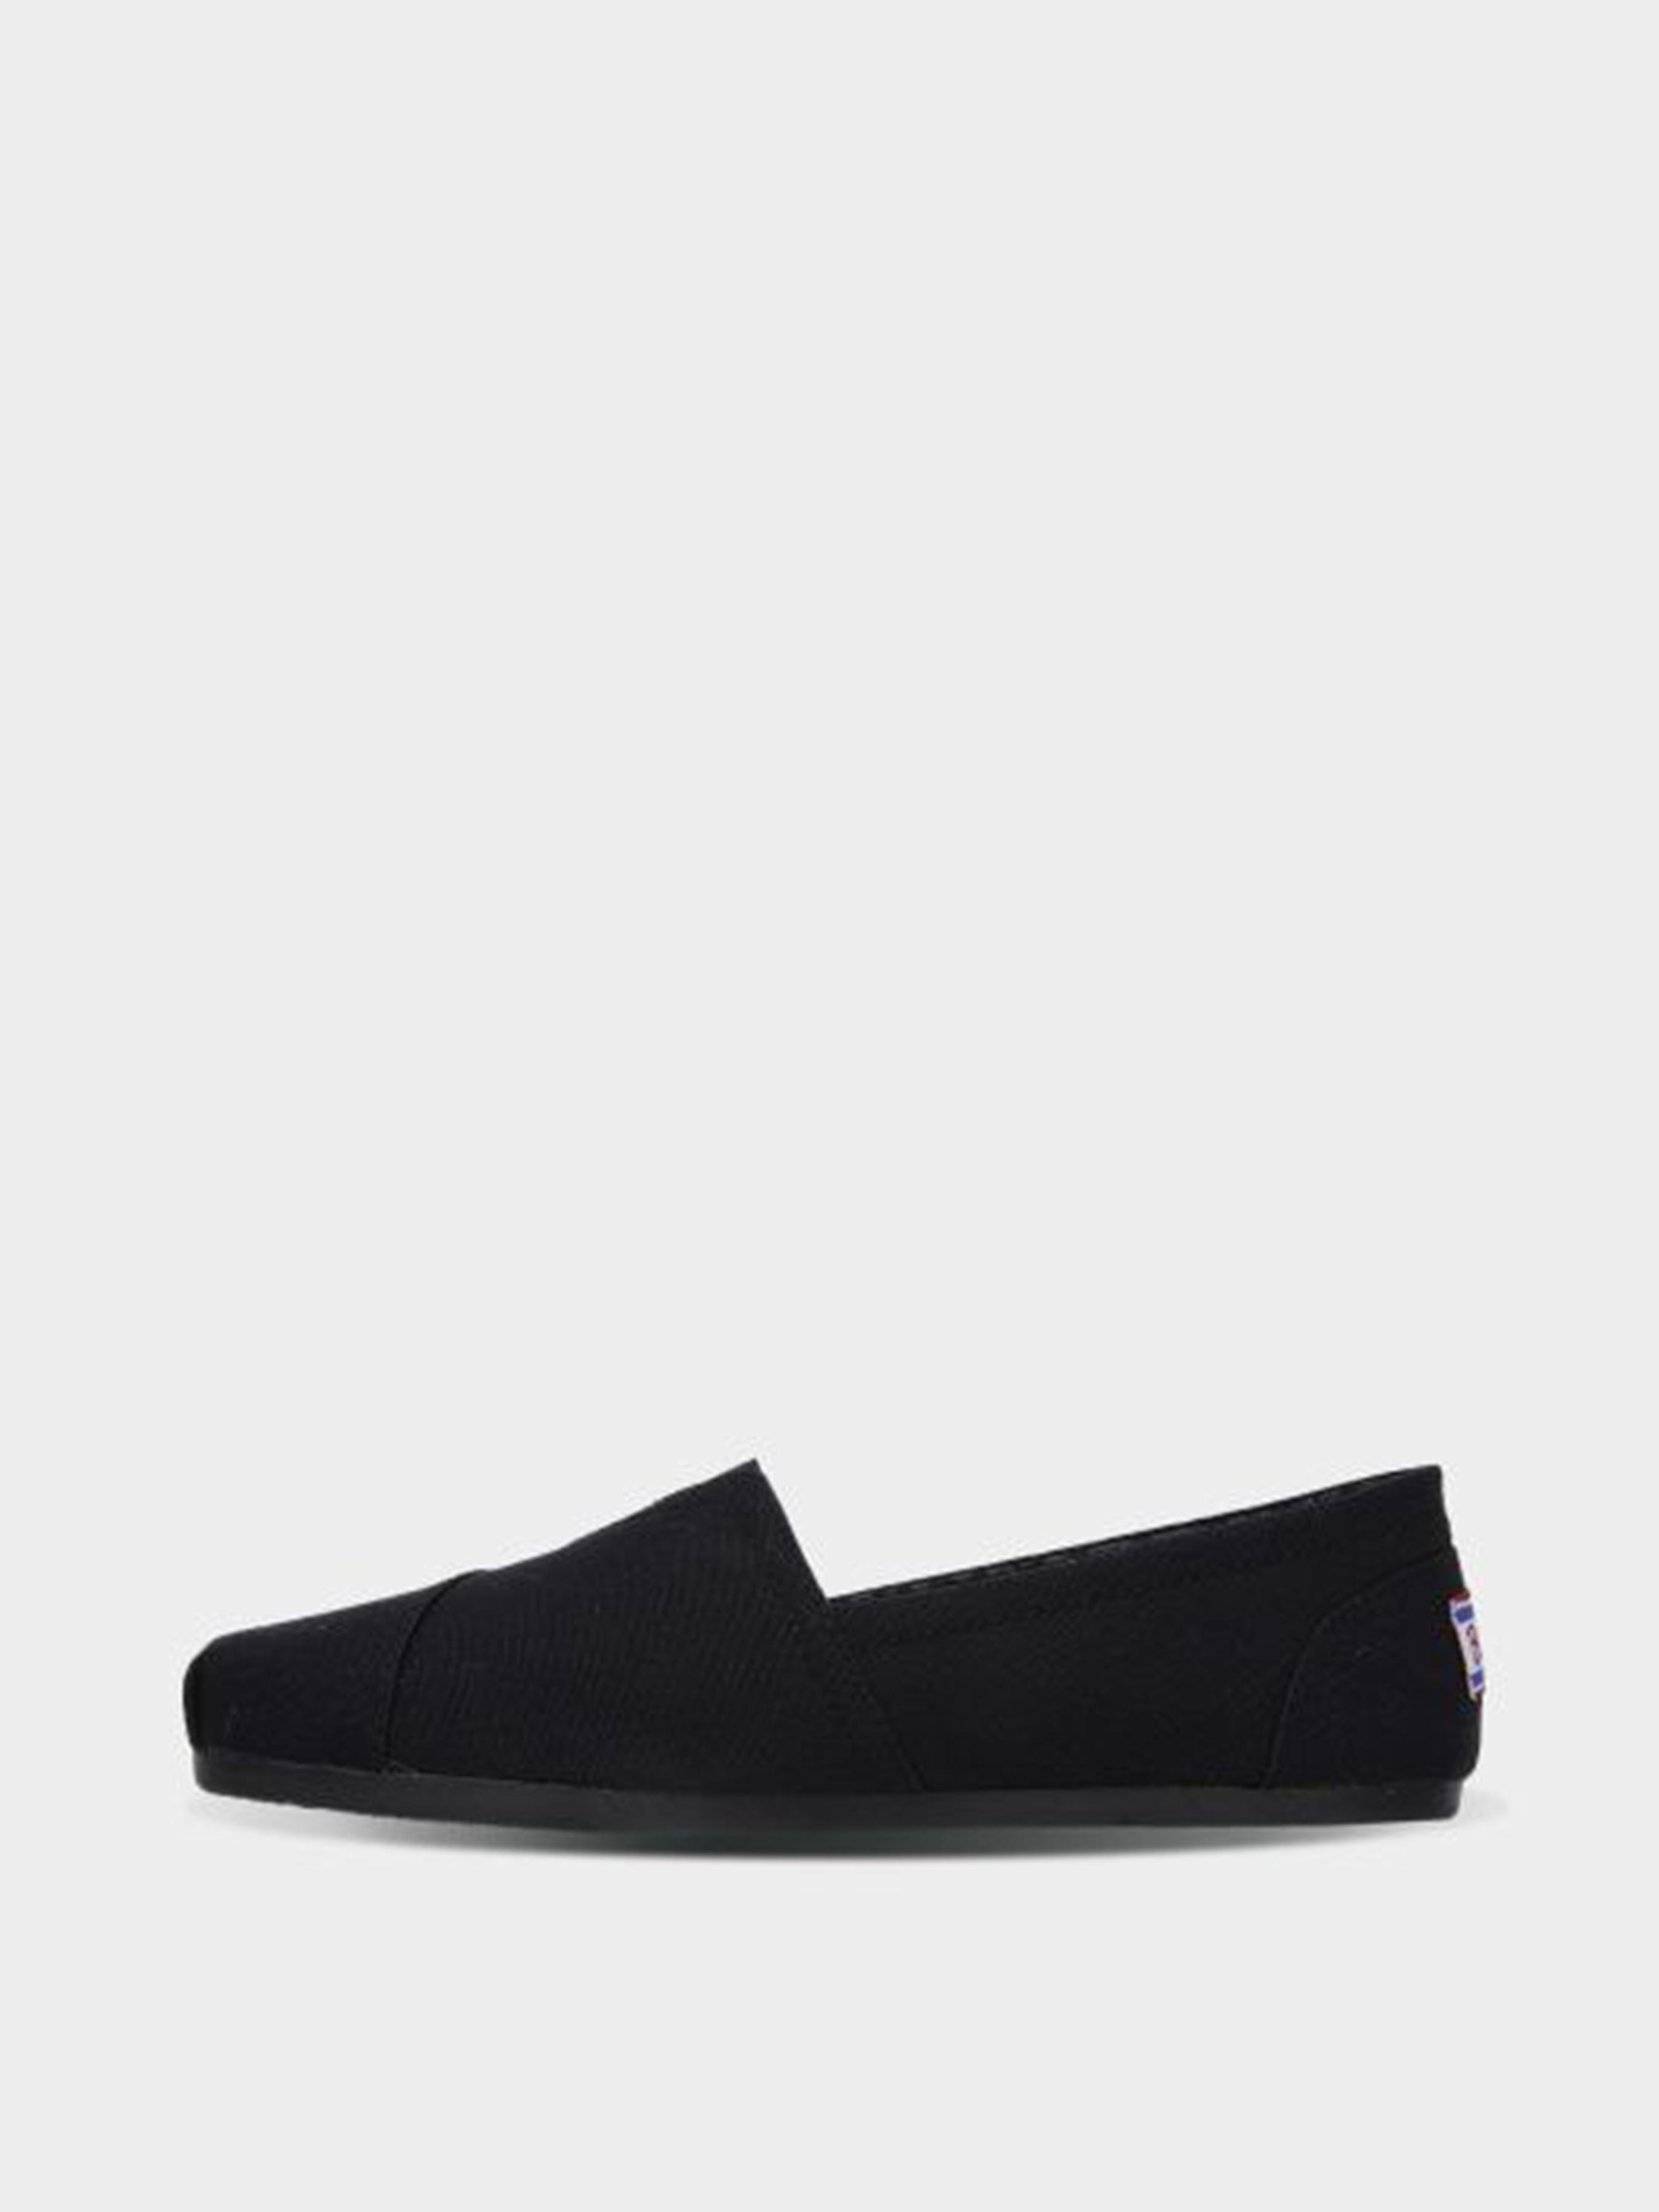 Cлипоны для женщин Skechers KW4045 размеры обуви, 2017